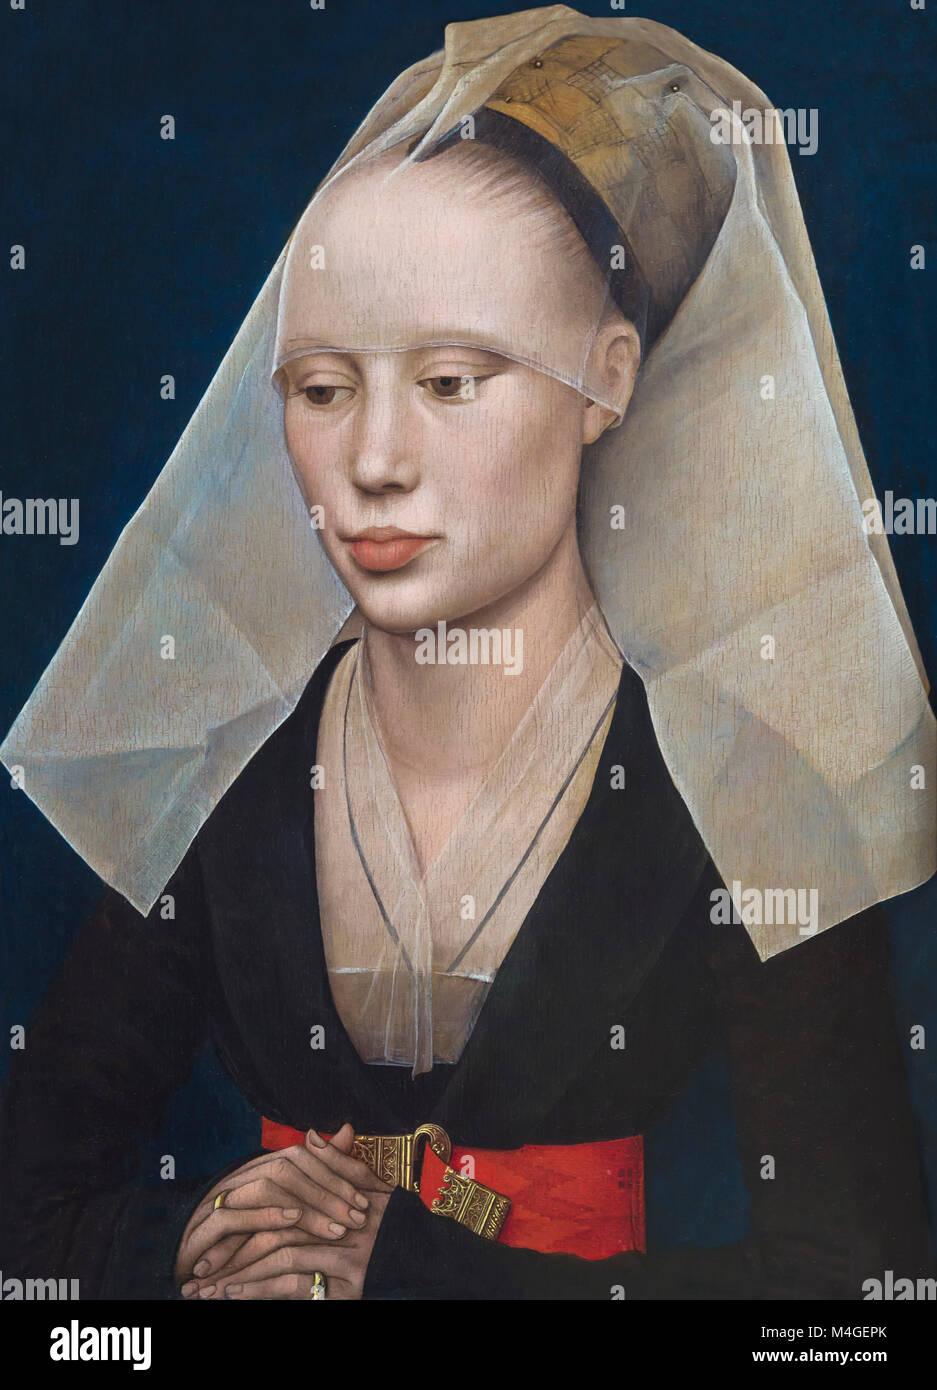 Portrait of a Lady, Rogier van der Weyden, circa 1460, National Gallery of Art, Washington DC, USA, North America - Stock Image